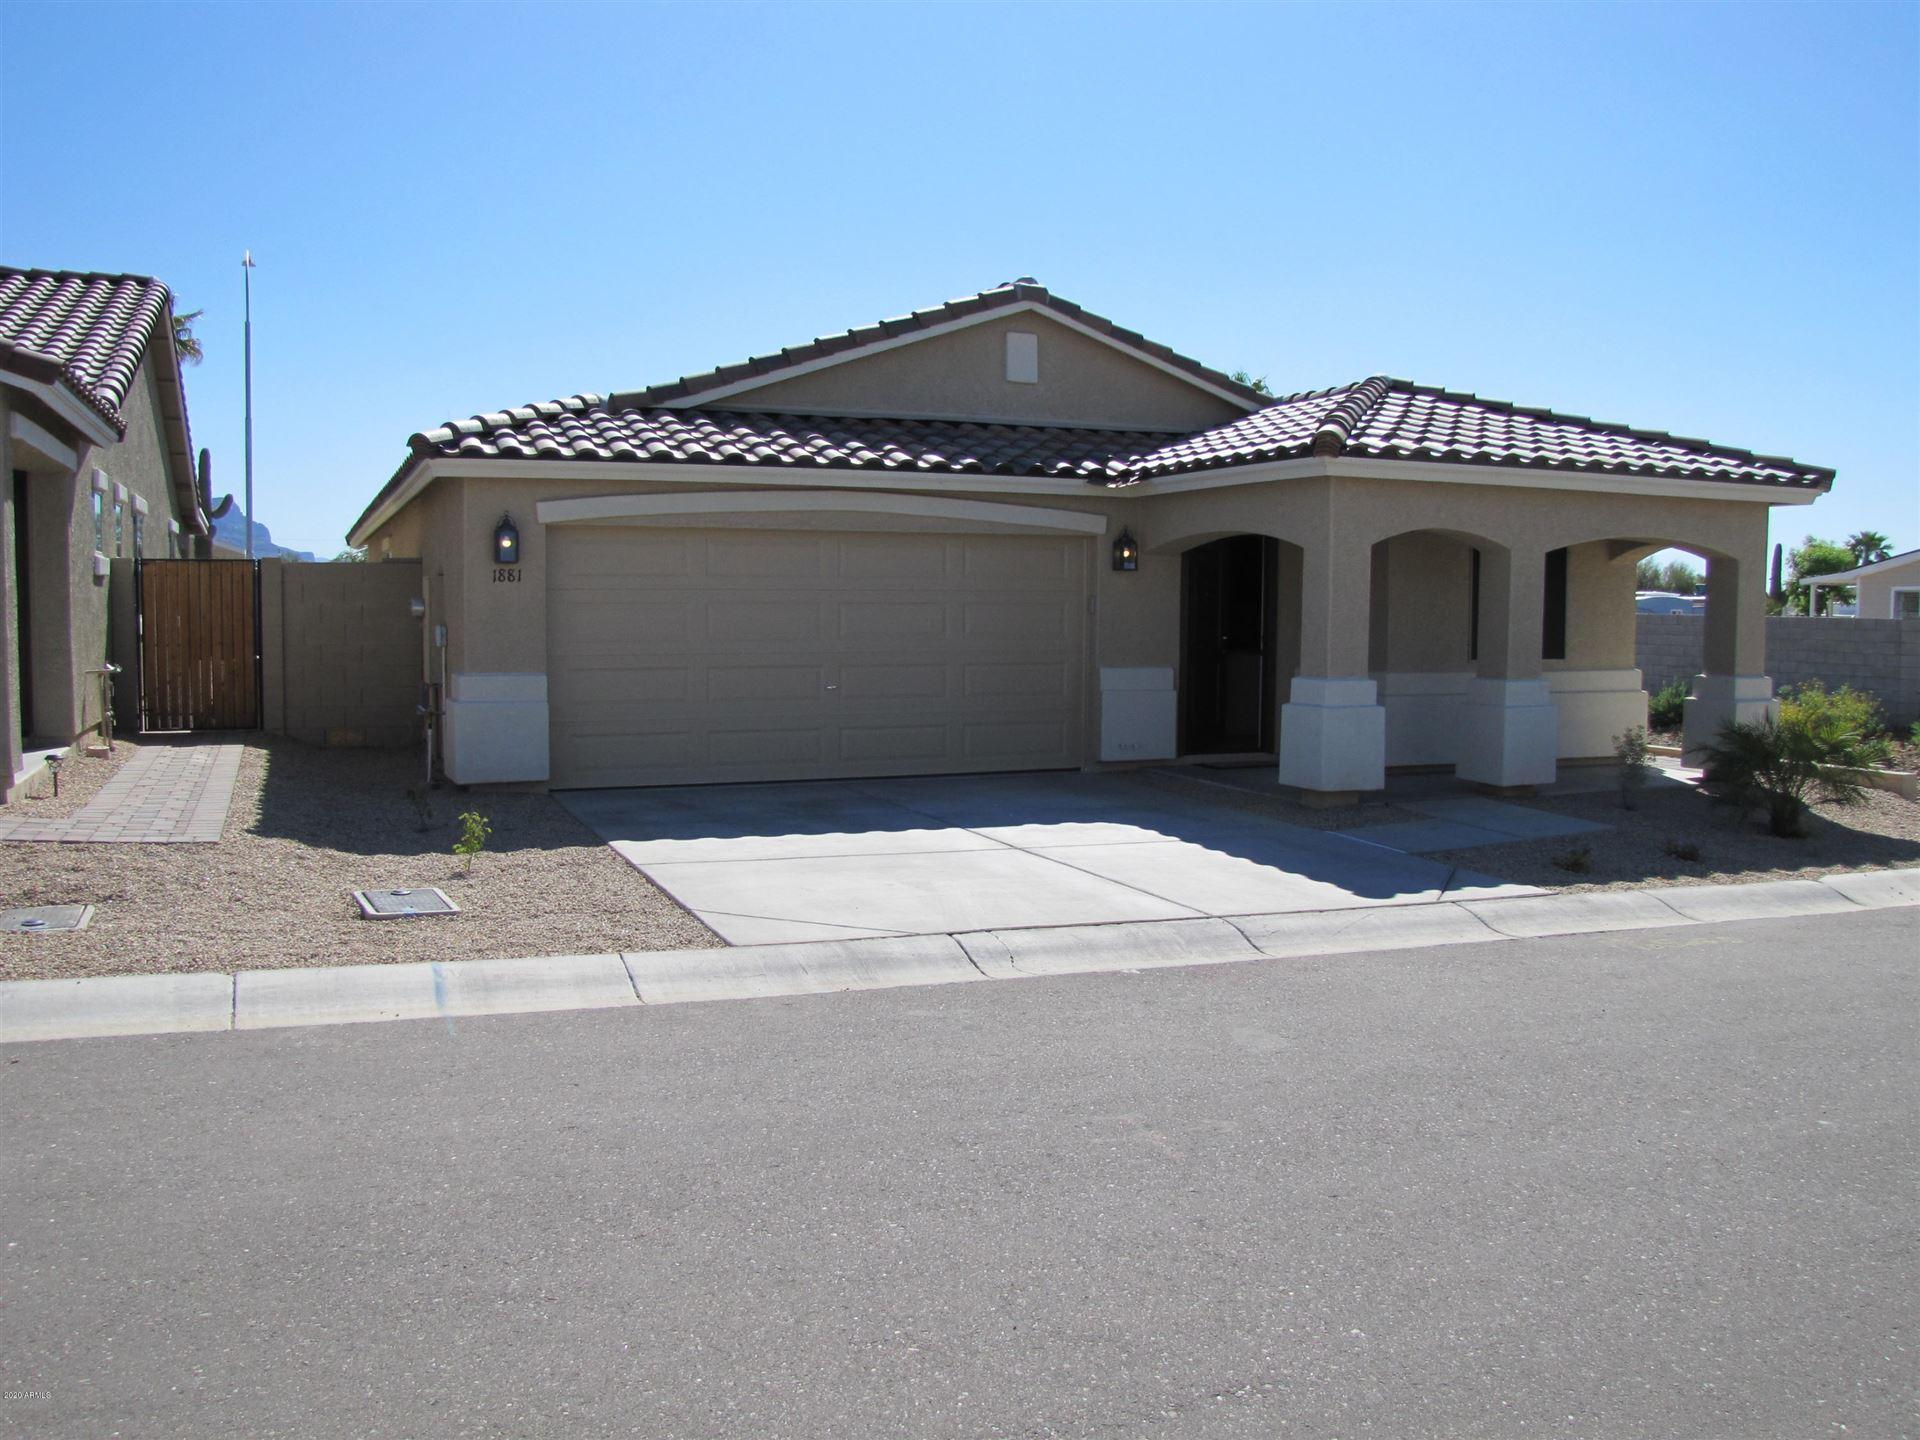 Photo of 1881 S EZRI Road, Apache Junction, AZ 85119 (MLS # 6268749)